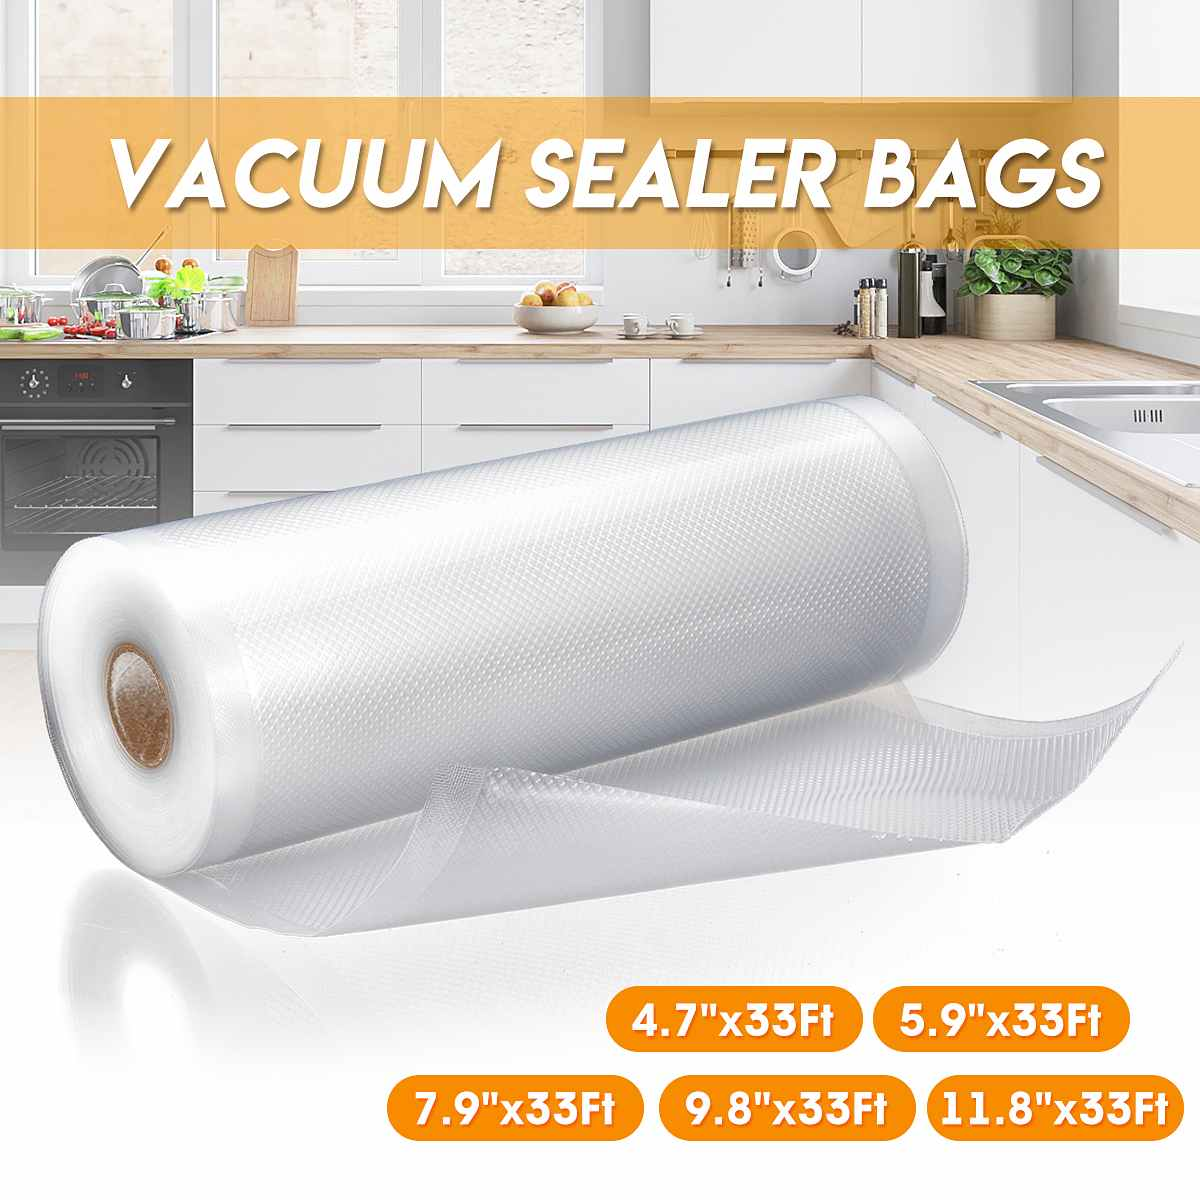 Vacuum Sealer Bags Vacuum Sealing Film Rolls For Food Vacuum Bags Kitchen Food Storage Sealer Saver Fresh Long Keeping 1000cm